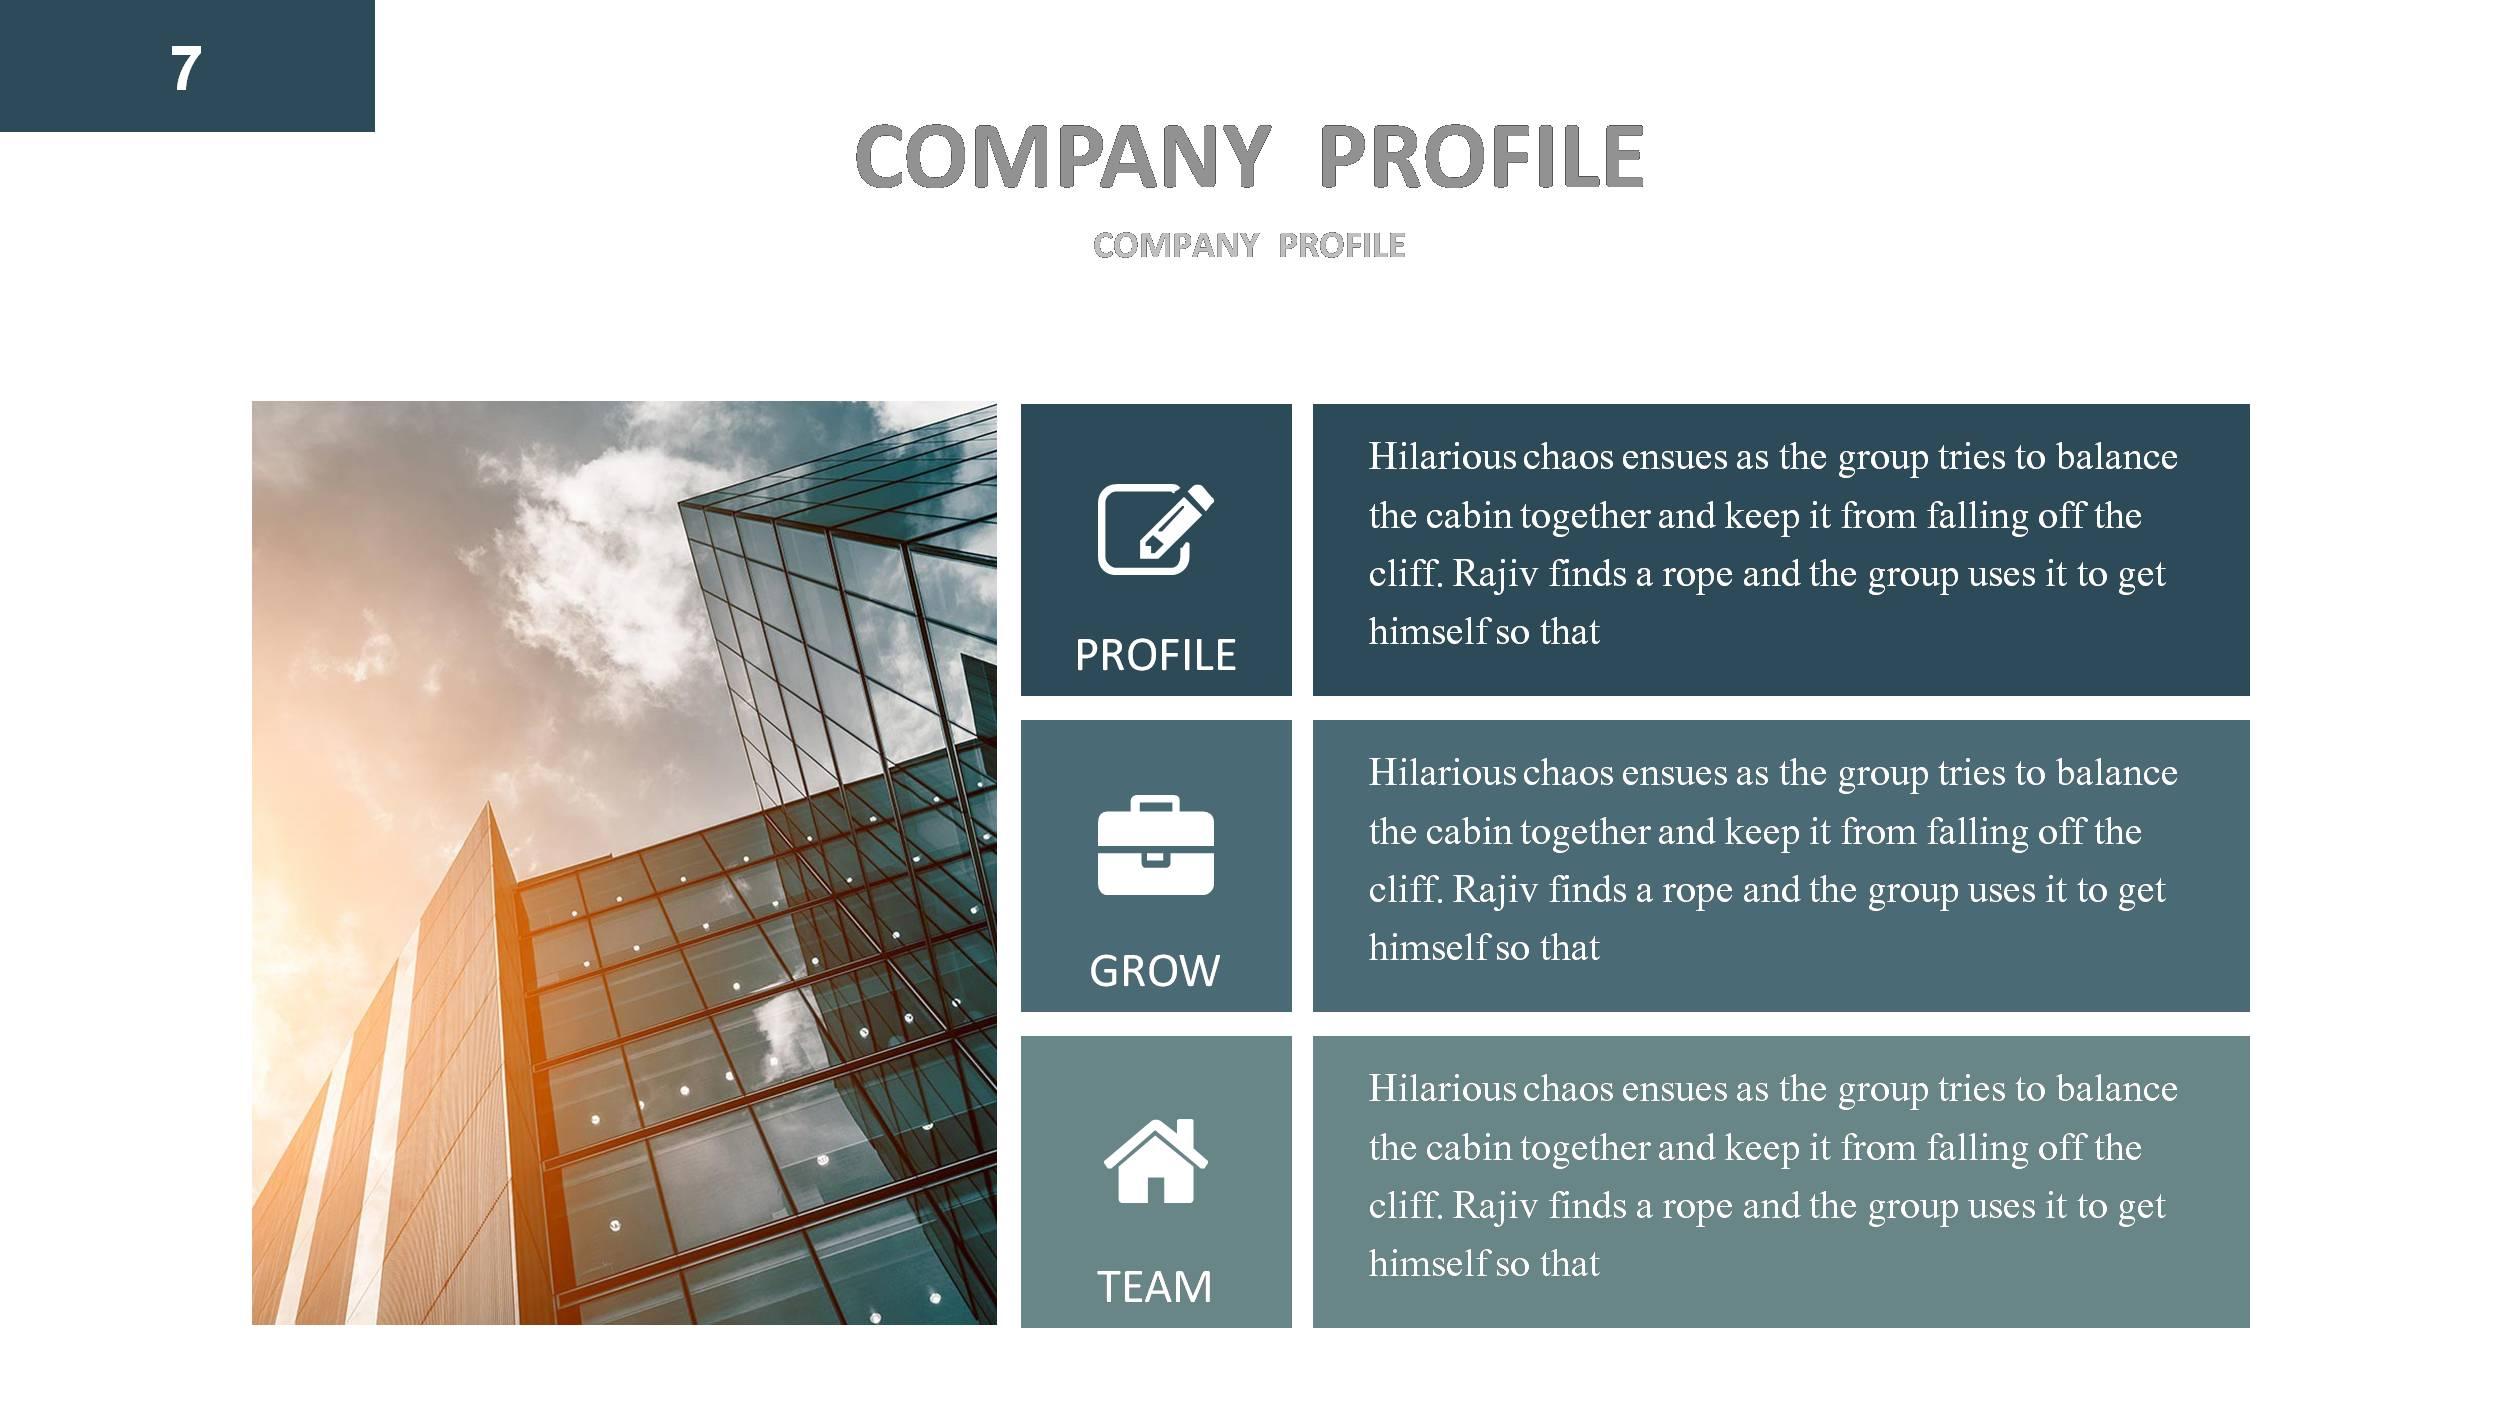 Company profile Google Slides Presentation Template by GardeniaDesign – Company Profile Templates